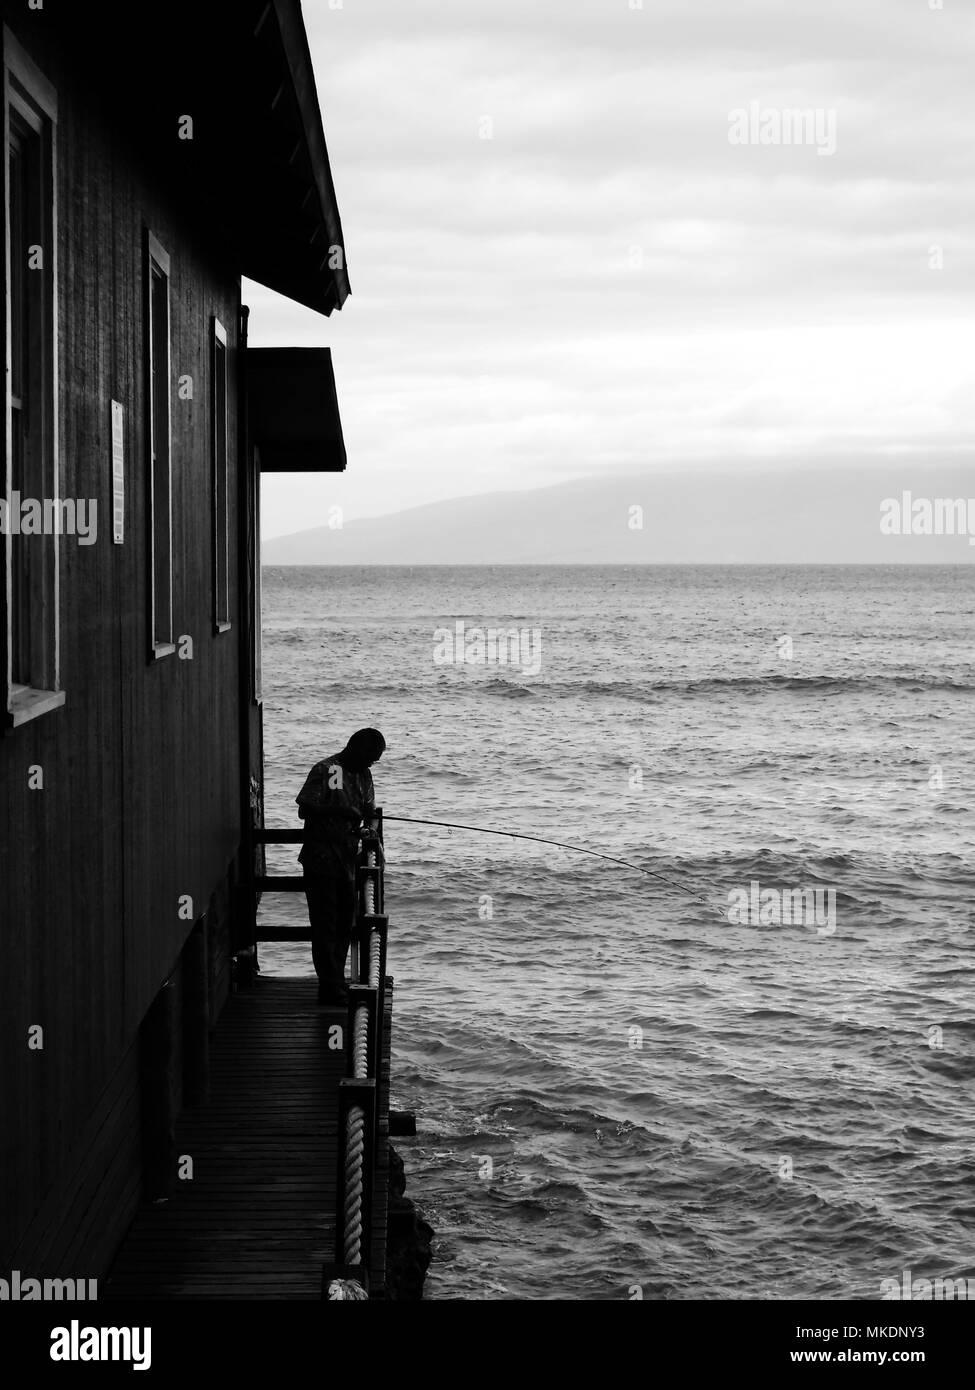 Man fishing next to building - Stock Image